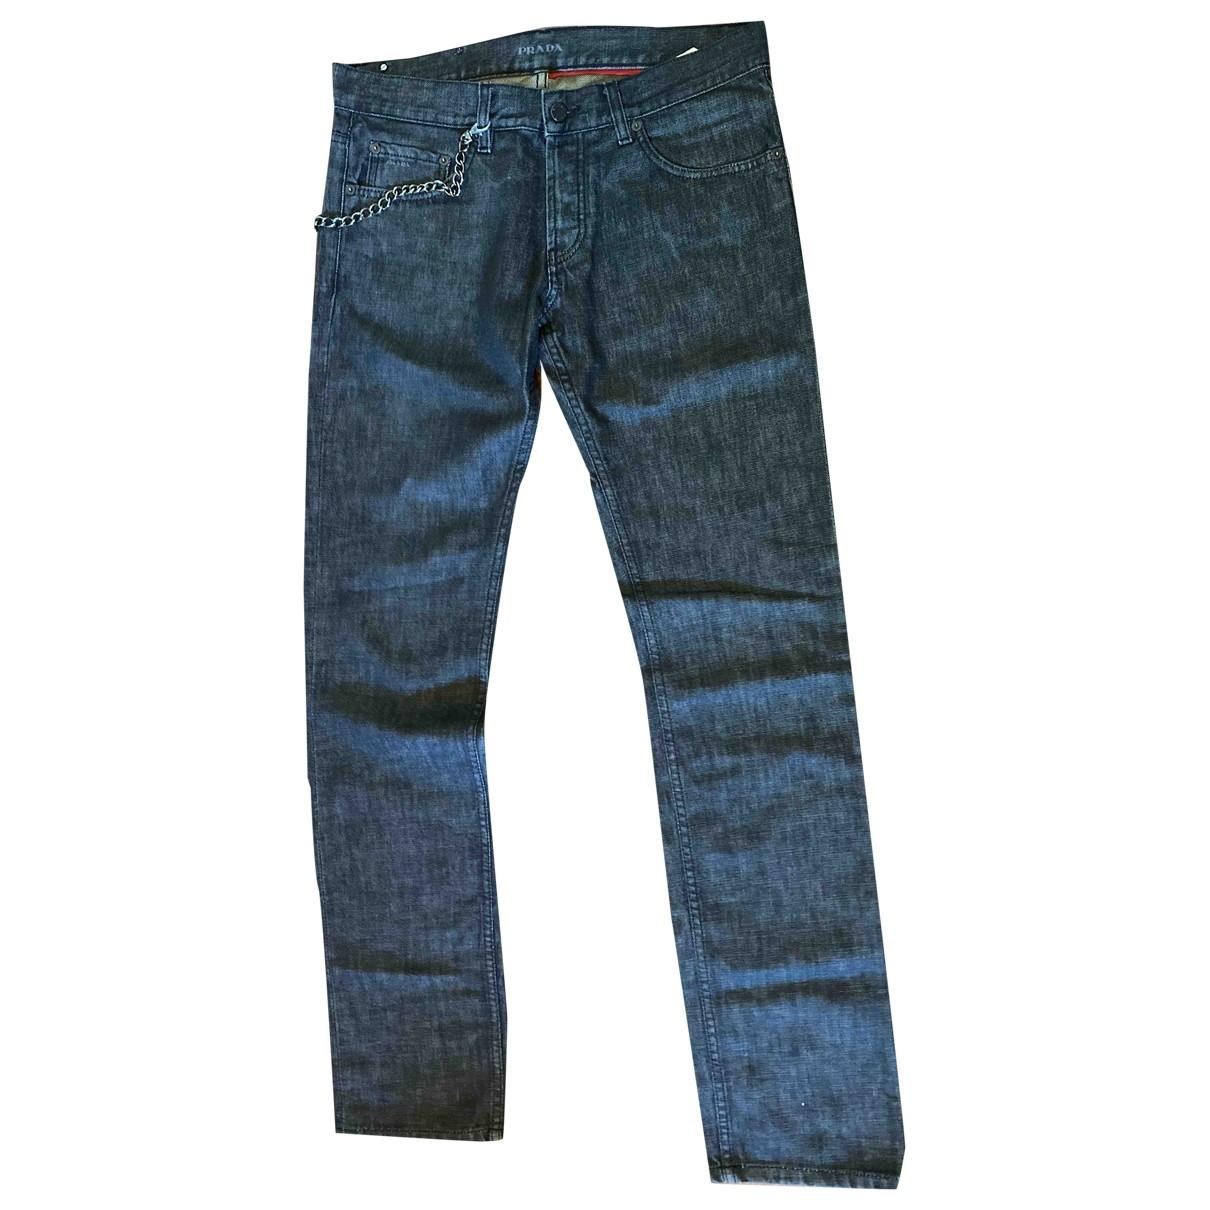 Prada \N Anthracite Cotton Jeans for Men 31 US